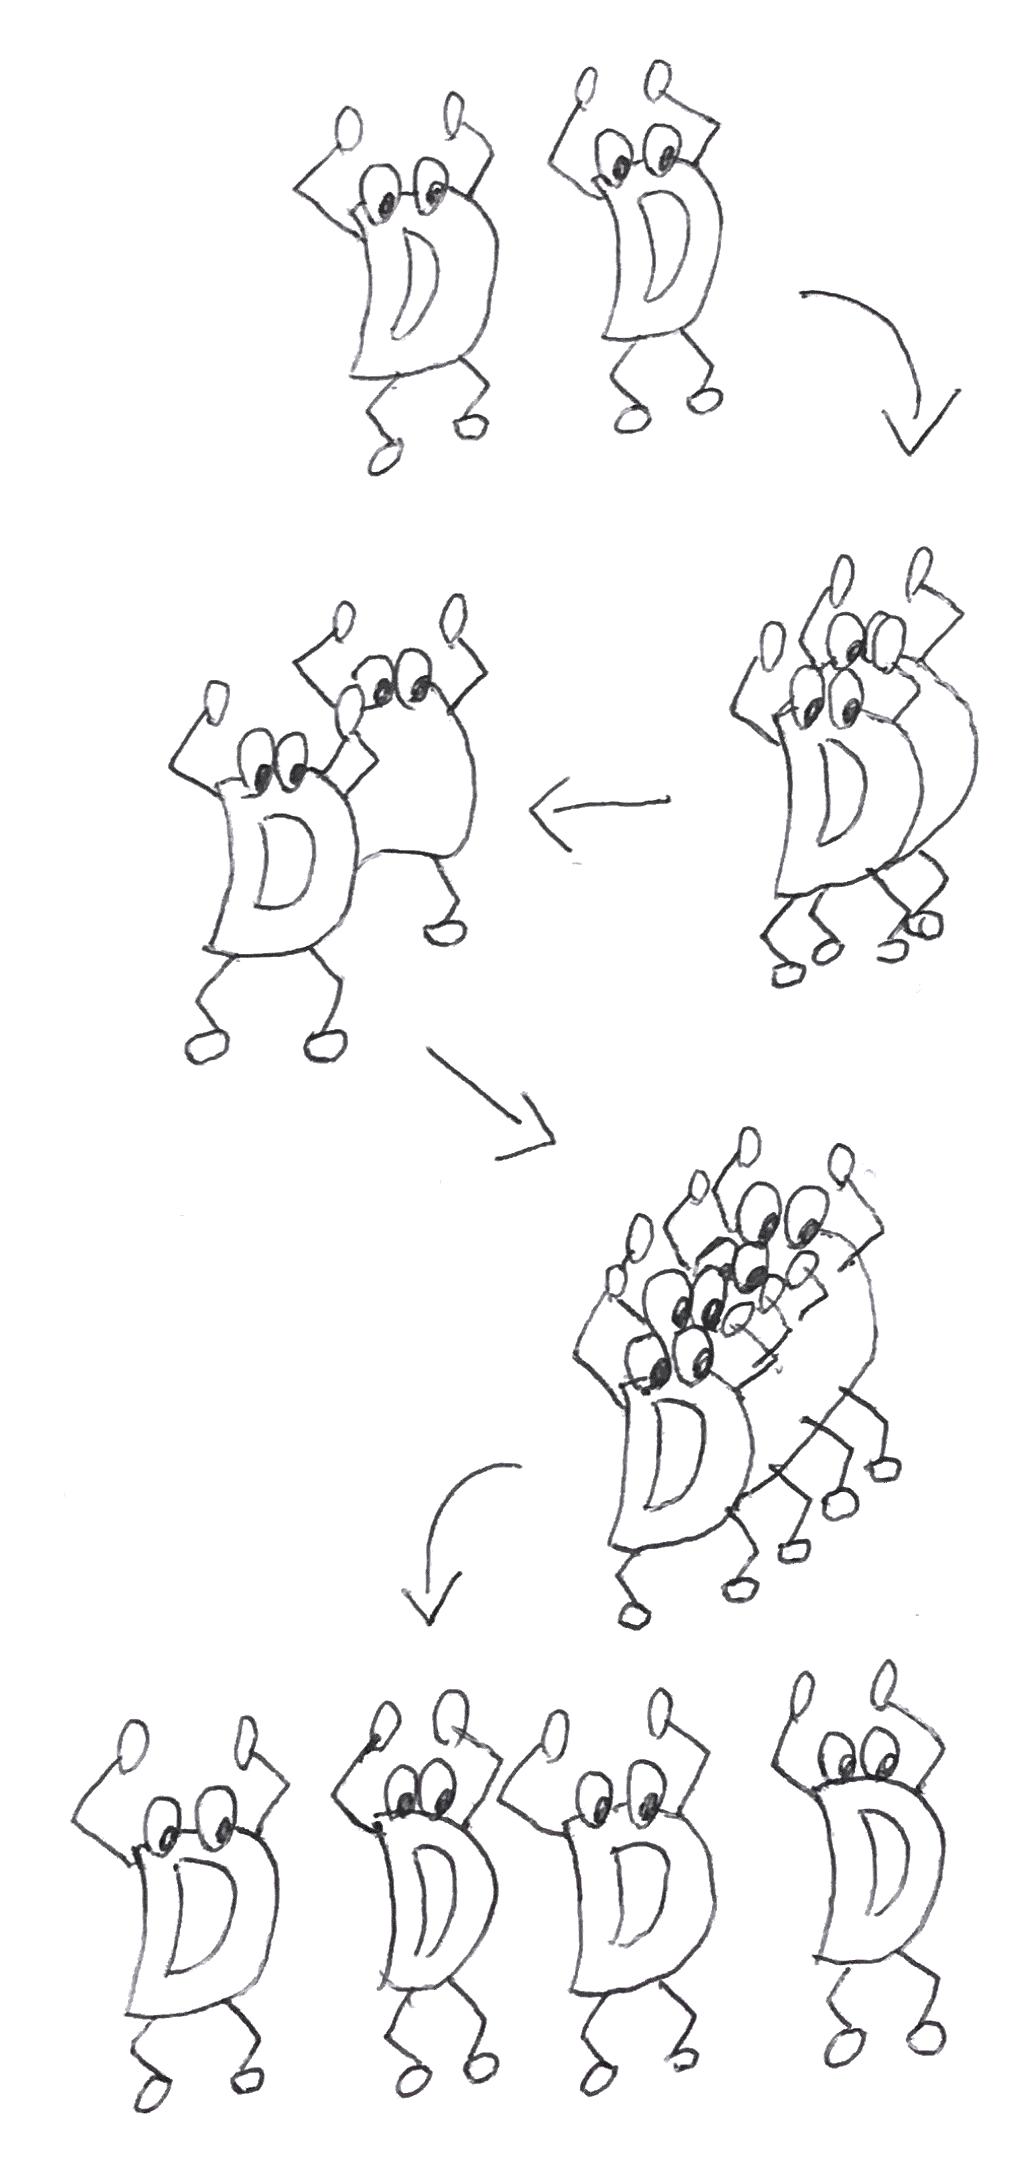 D言語くんの繁殖の様子を描いた現地住民のスケッチ